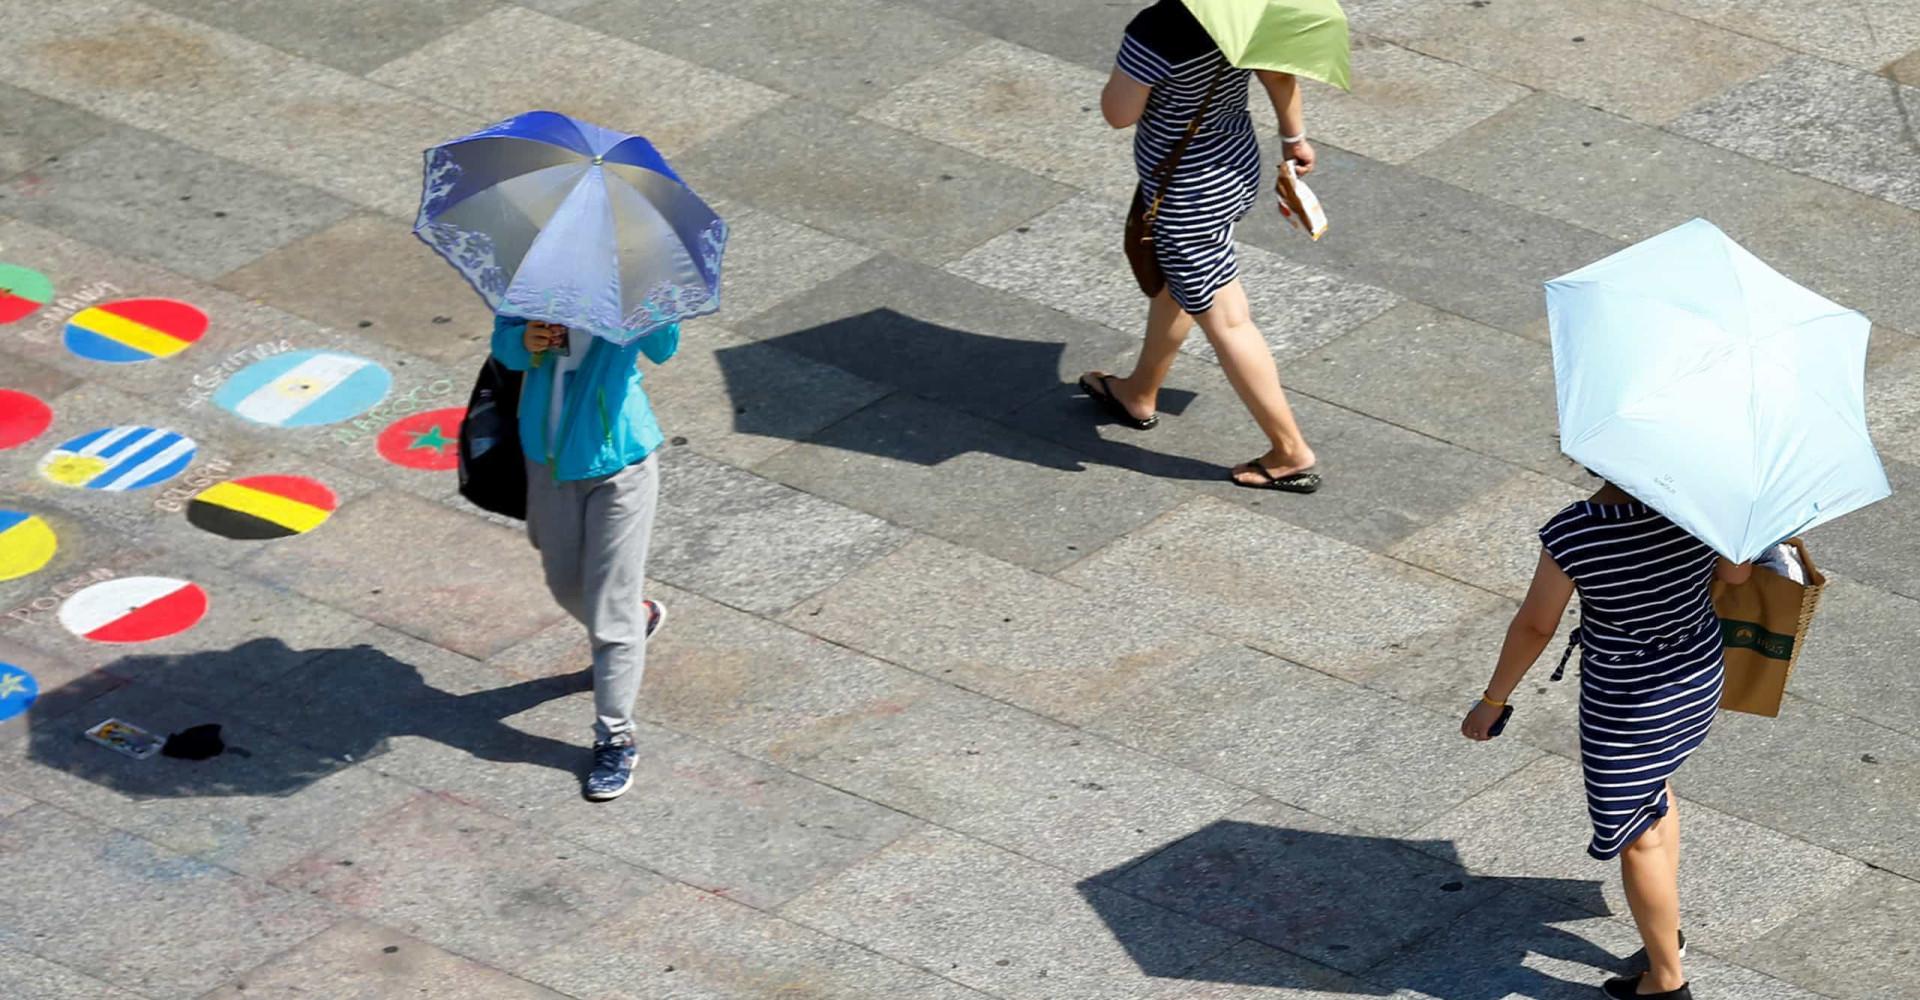 Europe bakes in new heatwave